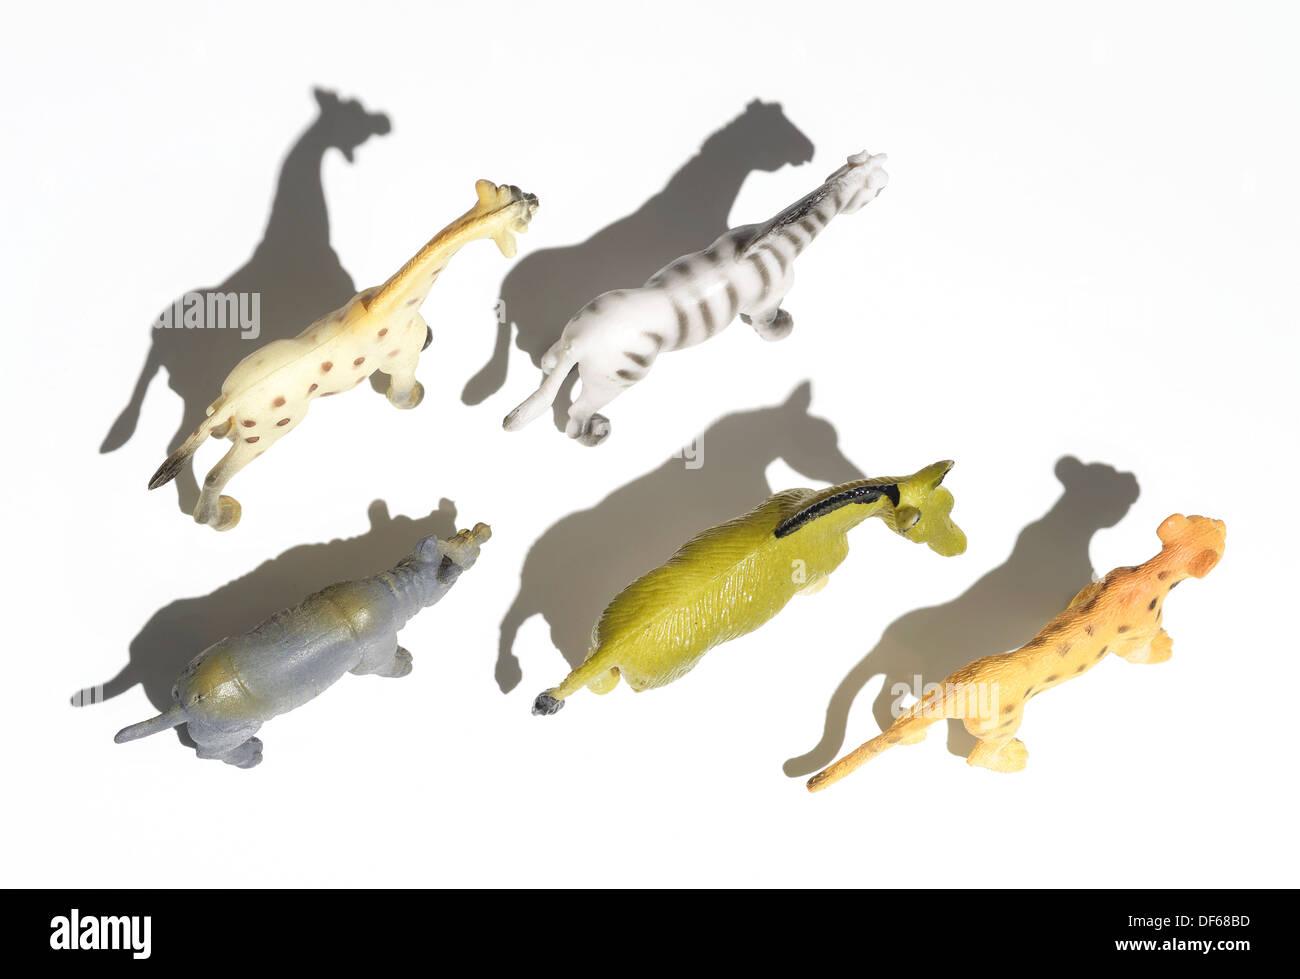 Kunststoff-Spielzeug Wildtiere overhead Stockbild